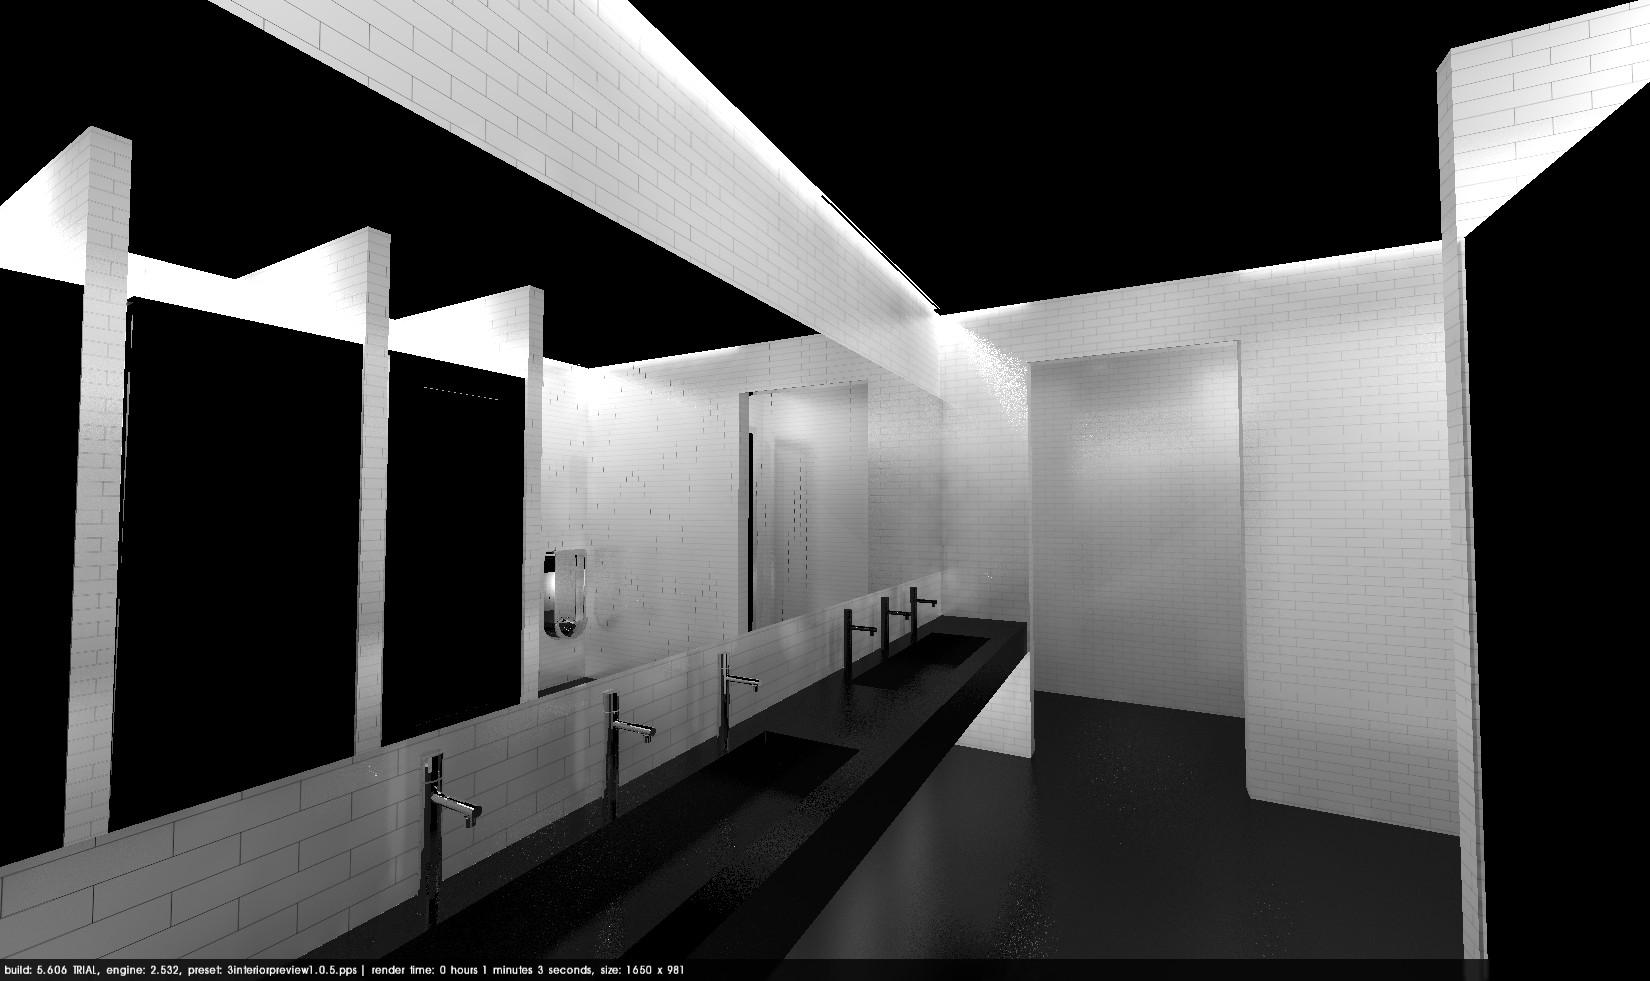 Suite 200 - 3D_17-0 2017-09-04 19560900000.jpg